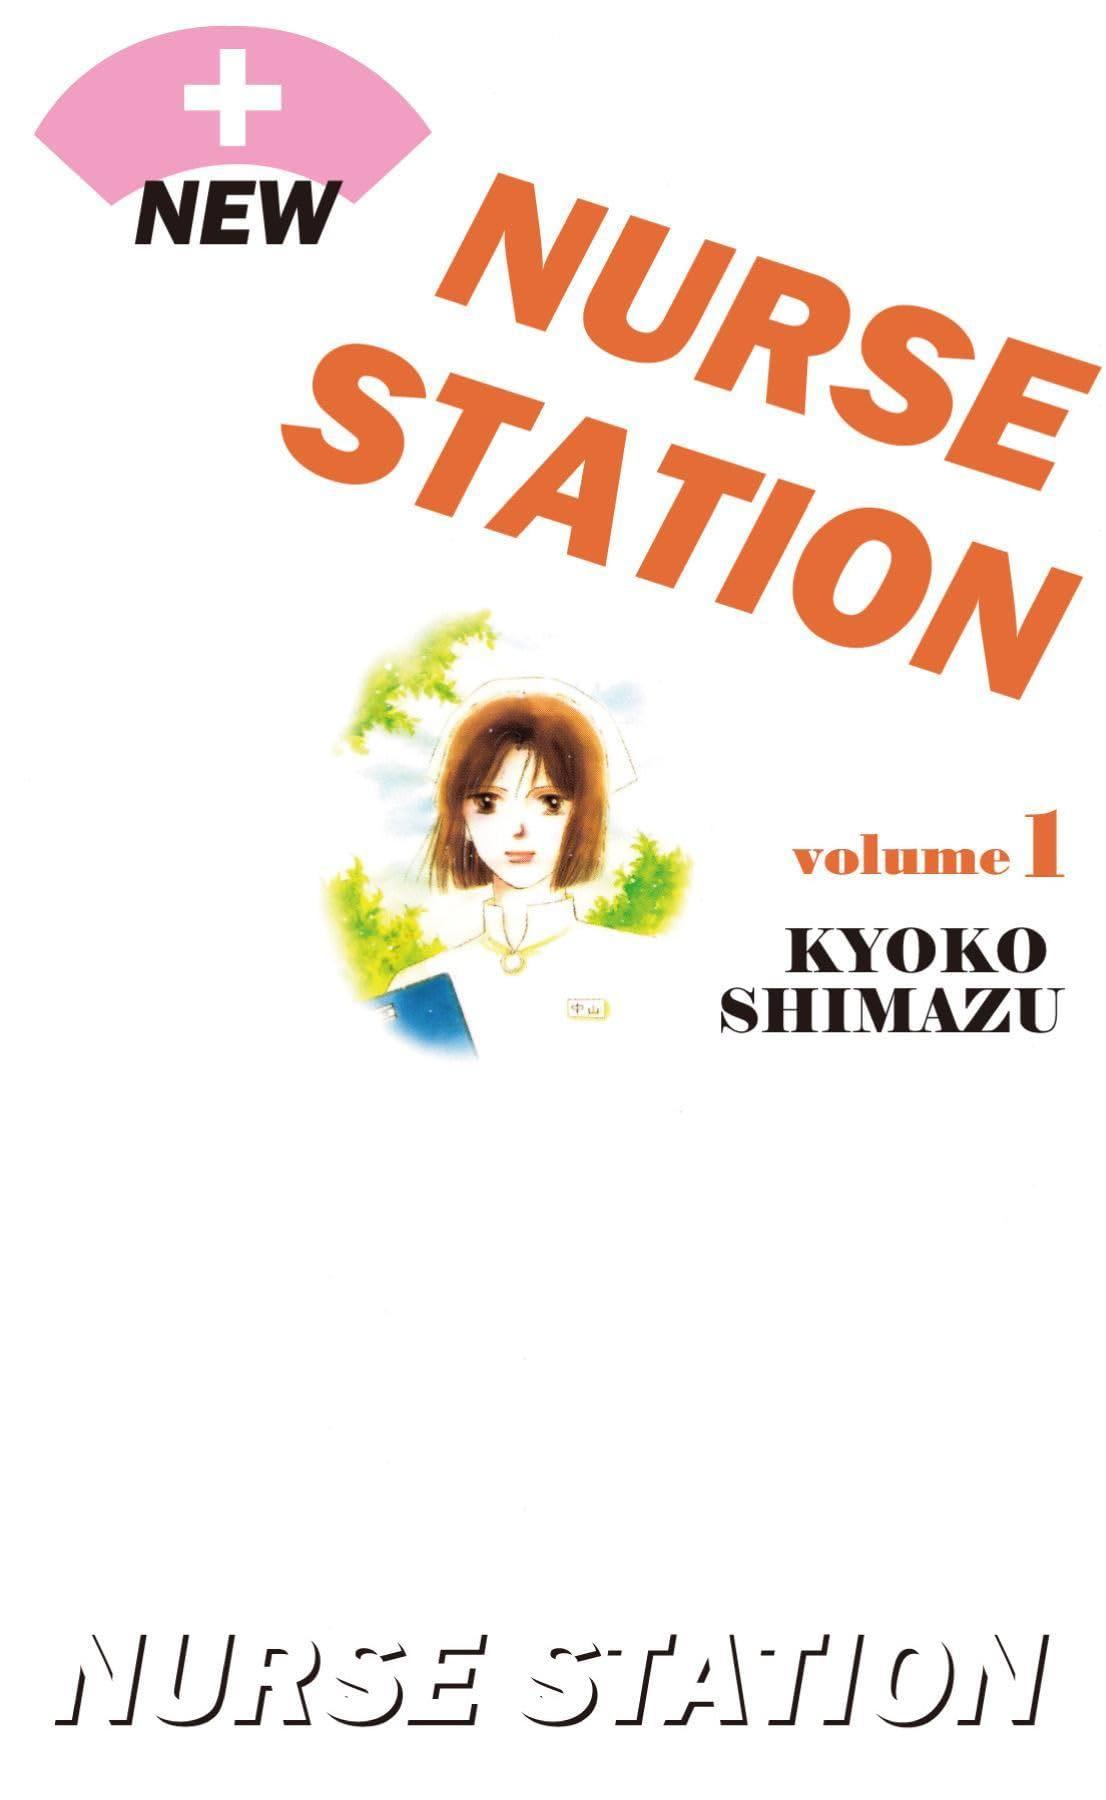 NEW NURSE STATION Vol. 1